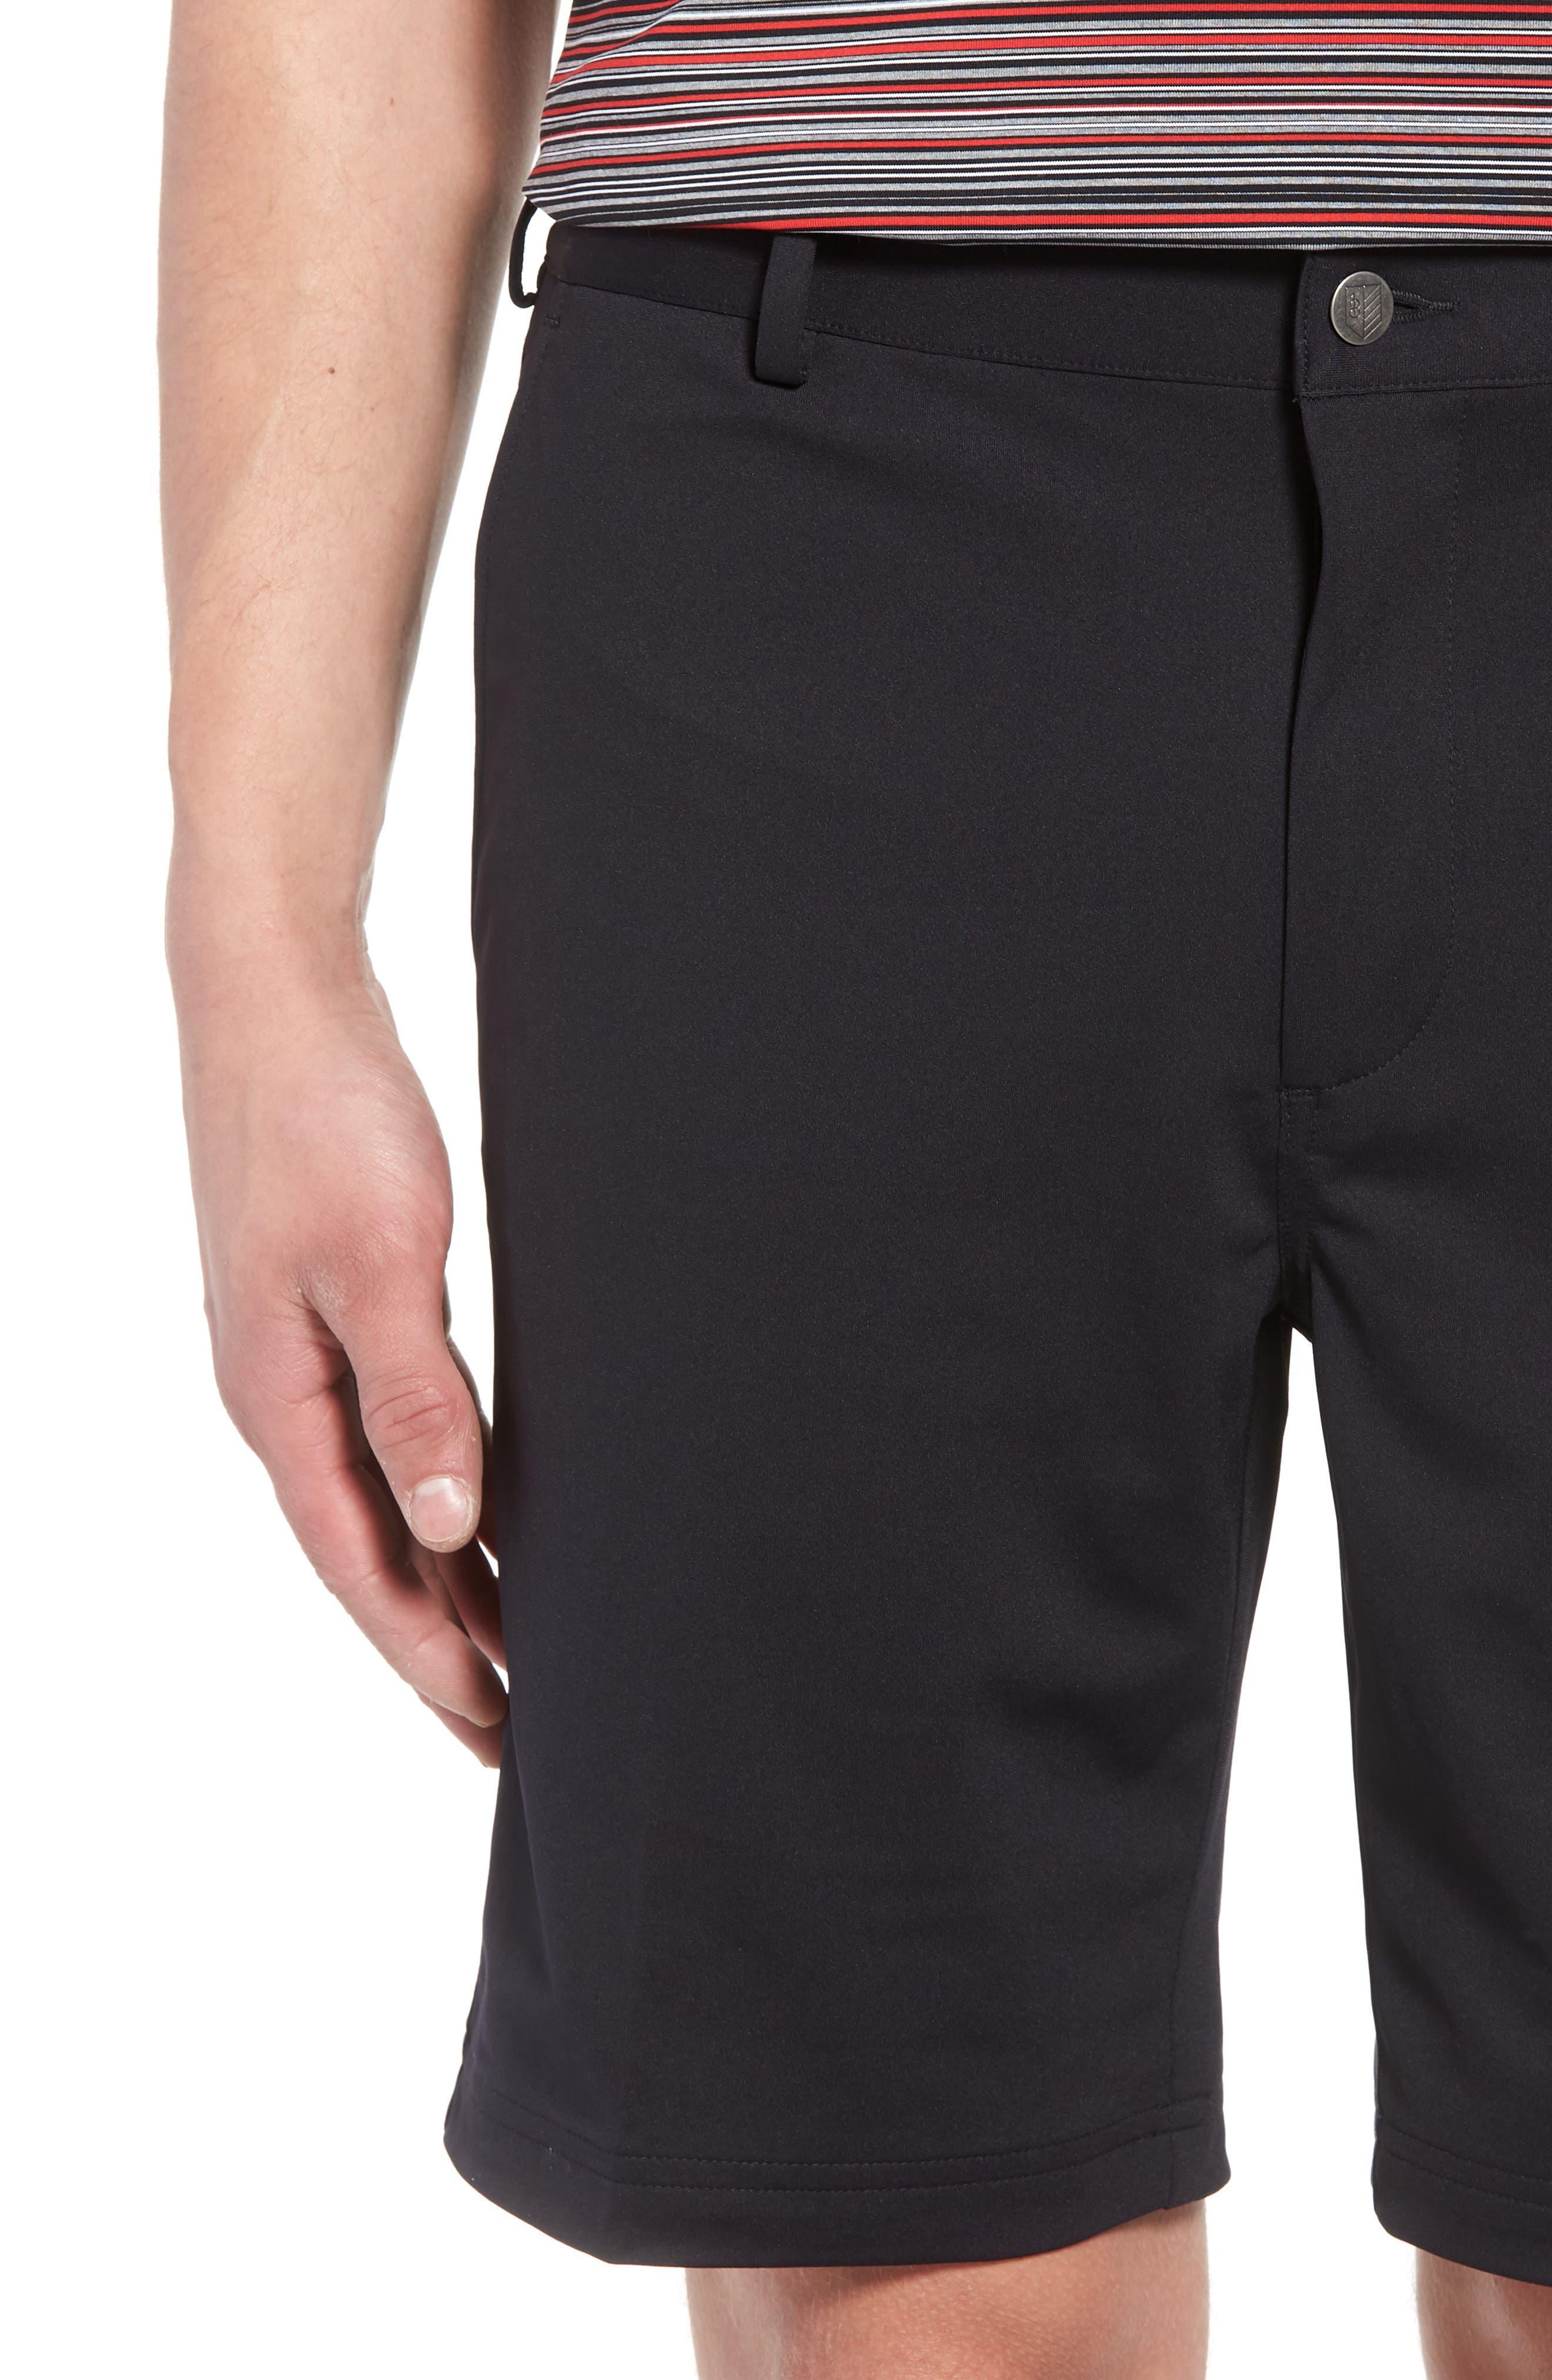 BOBBY JONES,                             Trim Fit Tech Chino Shorts,                             Alternate thumbnail 4, color,                             001